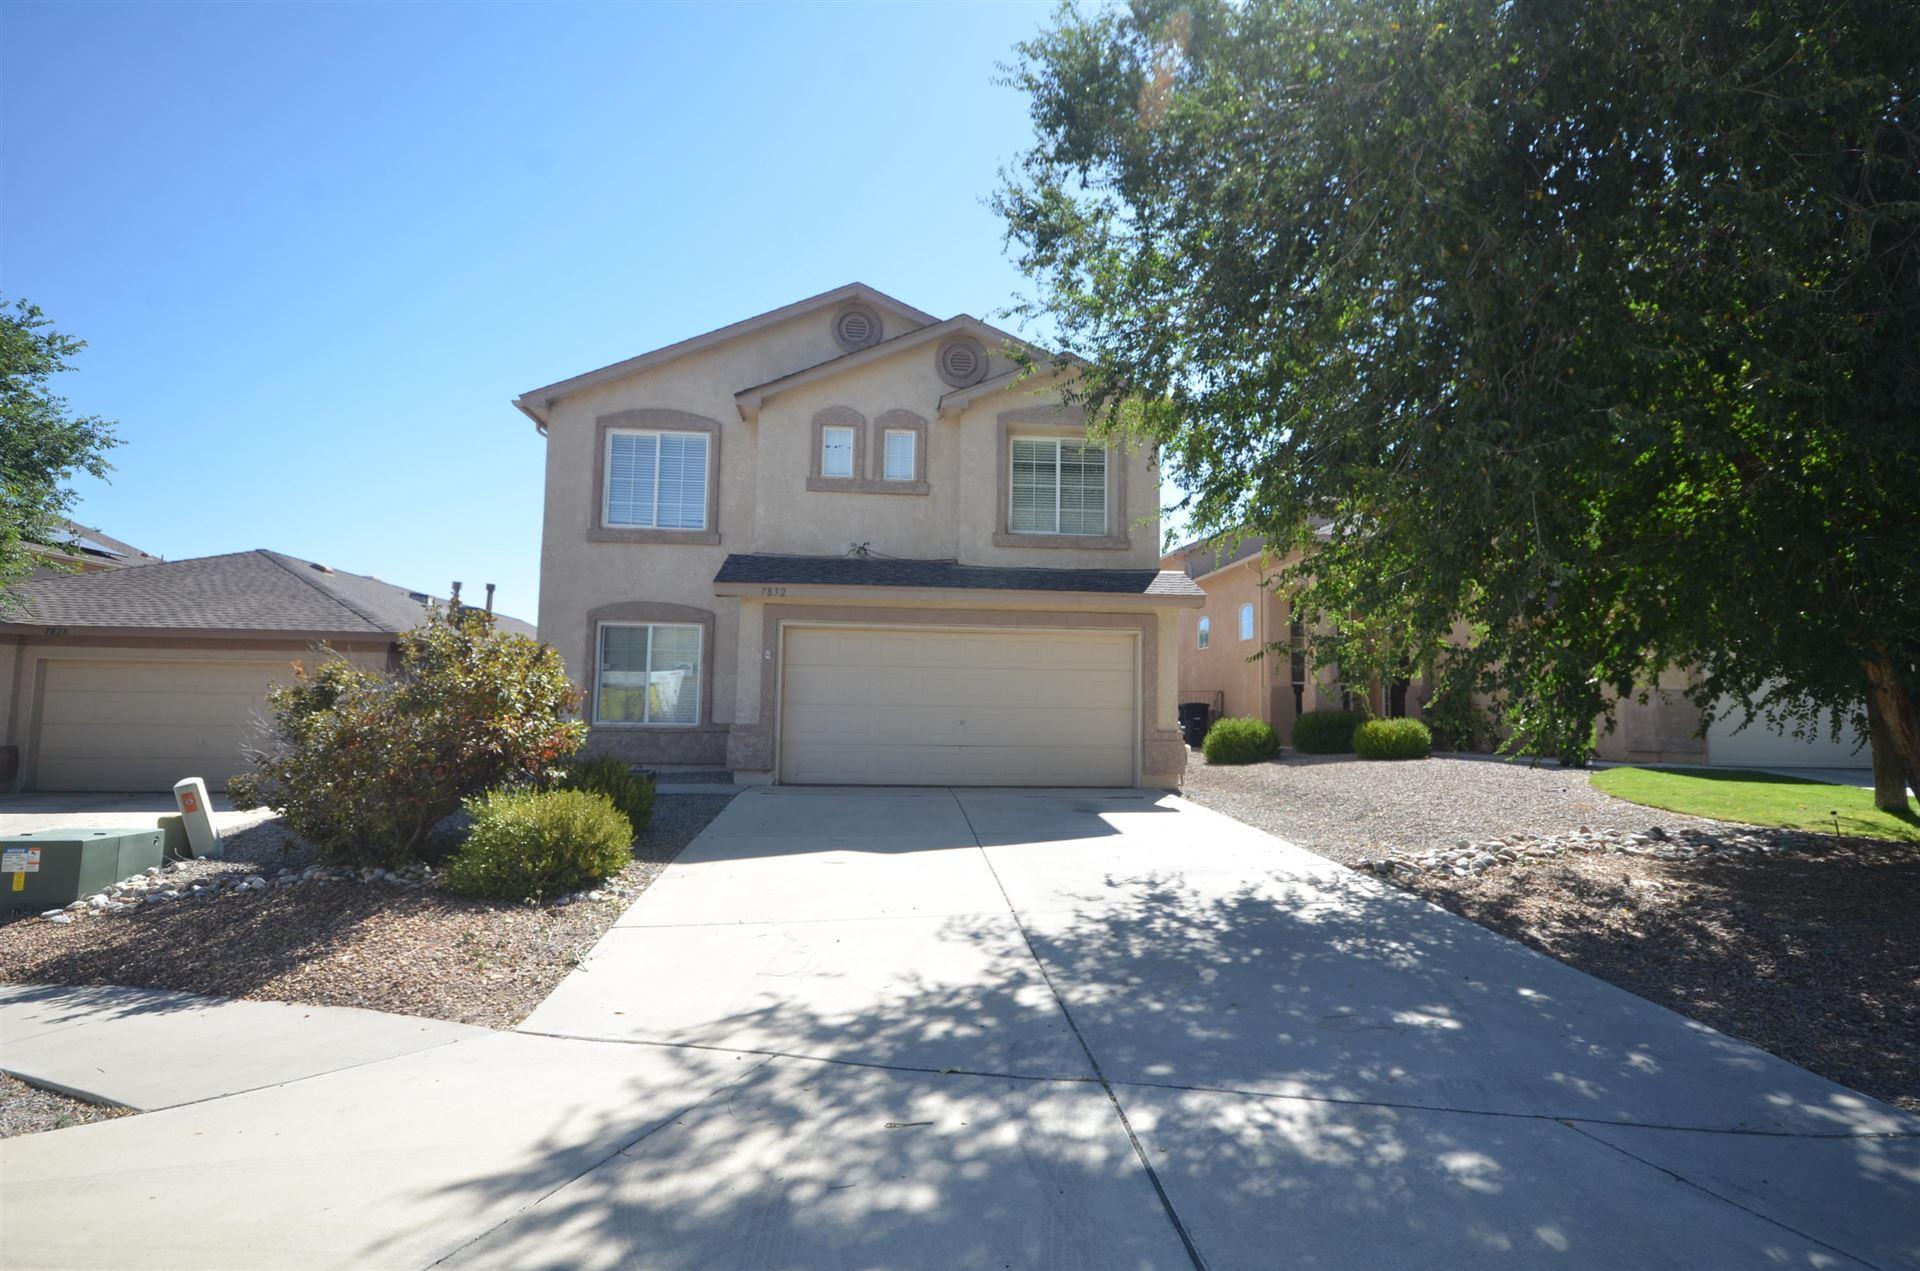 Photo of 7832 CHACO MESA Loop NW, Albuquerque, NM 87114 (MLS # 980134)